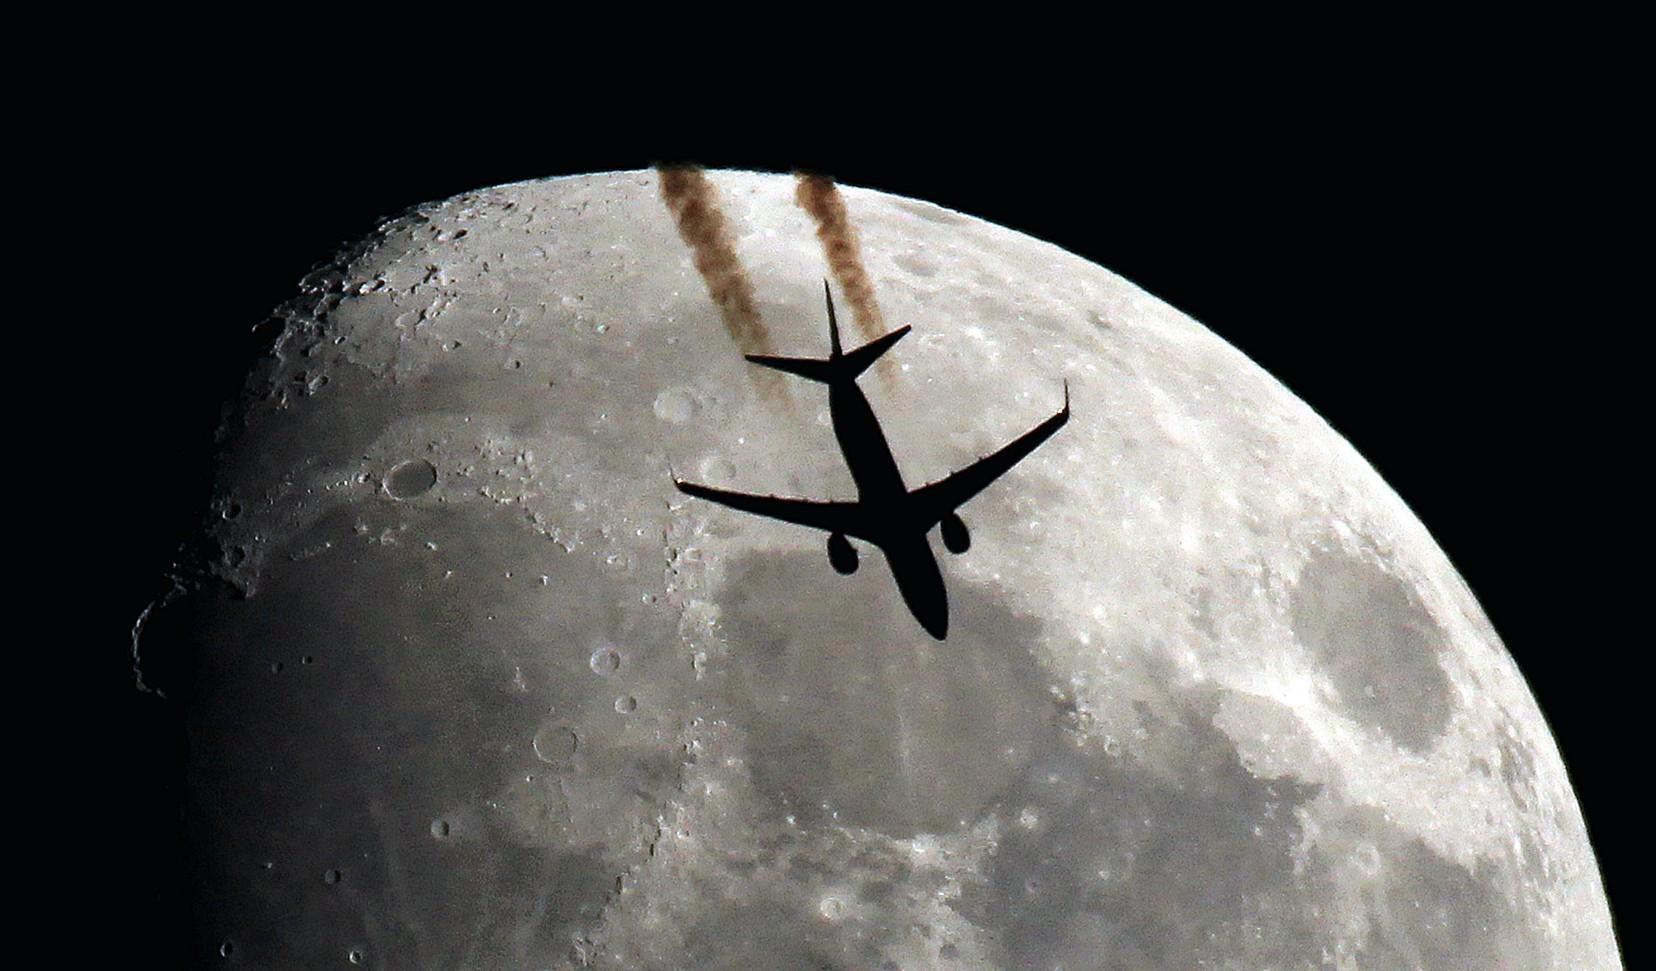 RT @lebribri: @El_Universo_Hoy Wow ! #BOEING737 (US) in SPACE !   photo: @lebribri (France) http://t.co/5IFeVryVzM